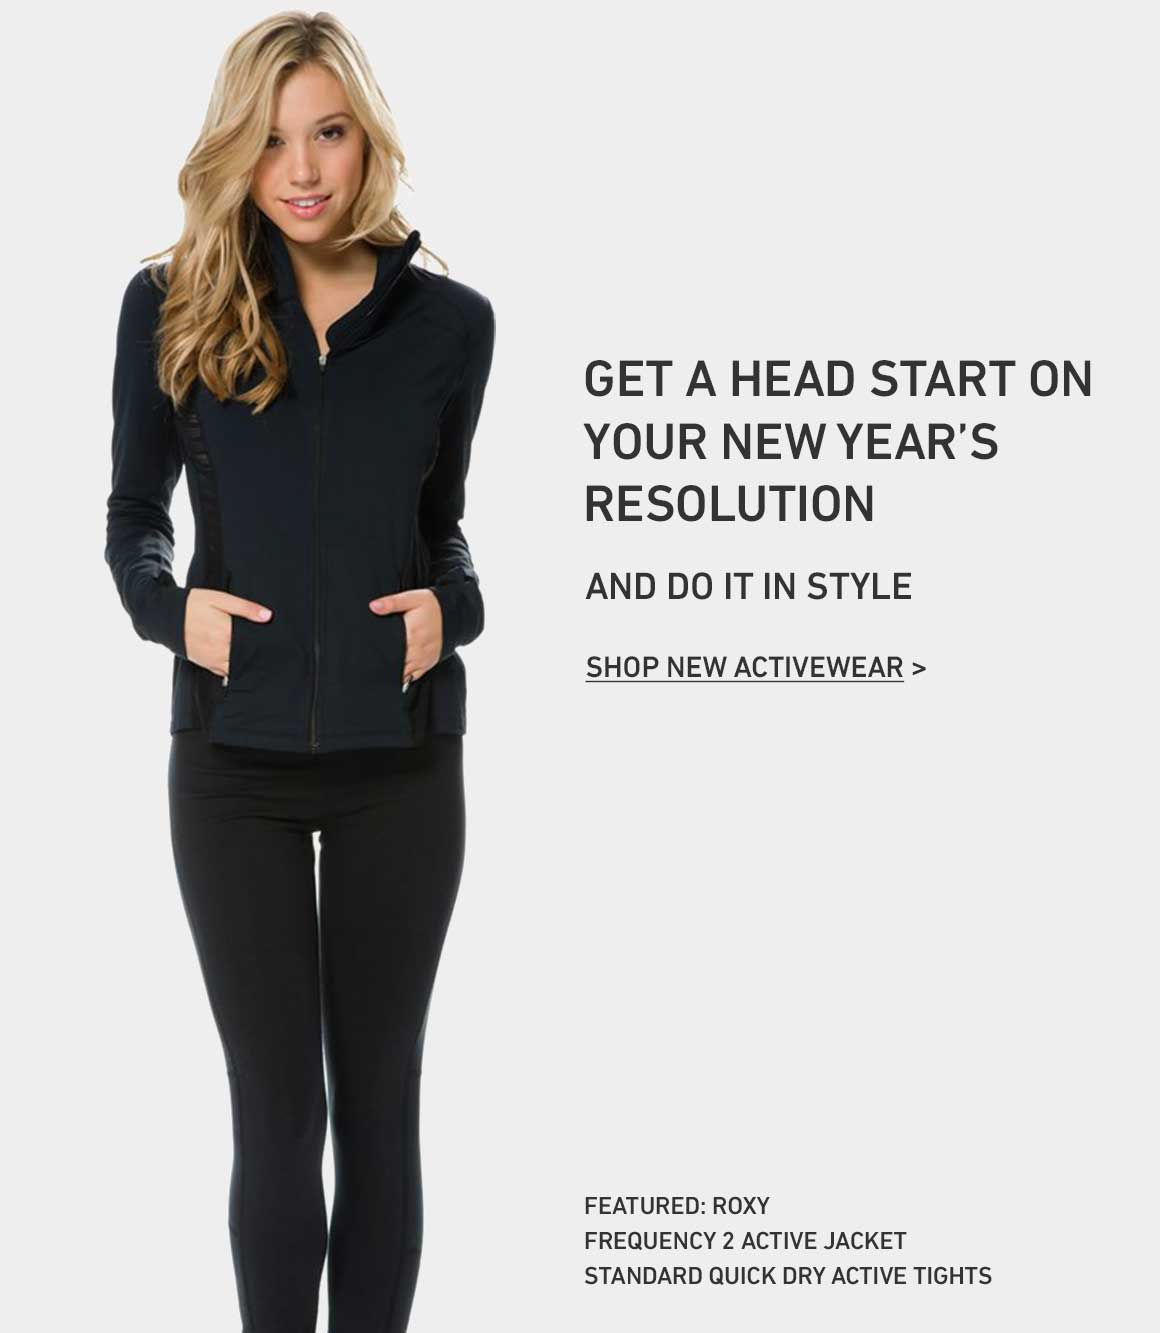 Shop New Activewear